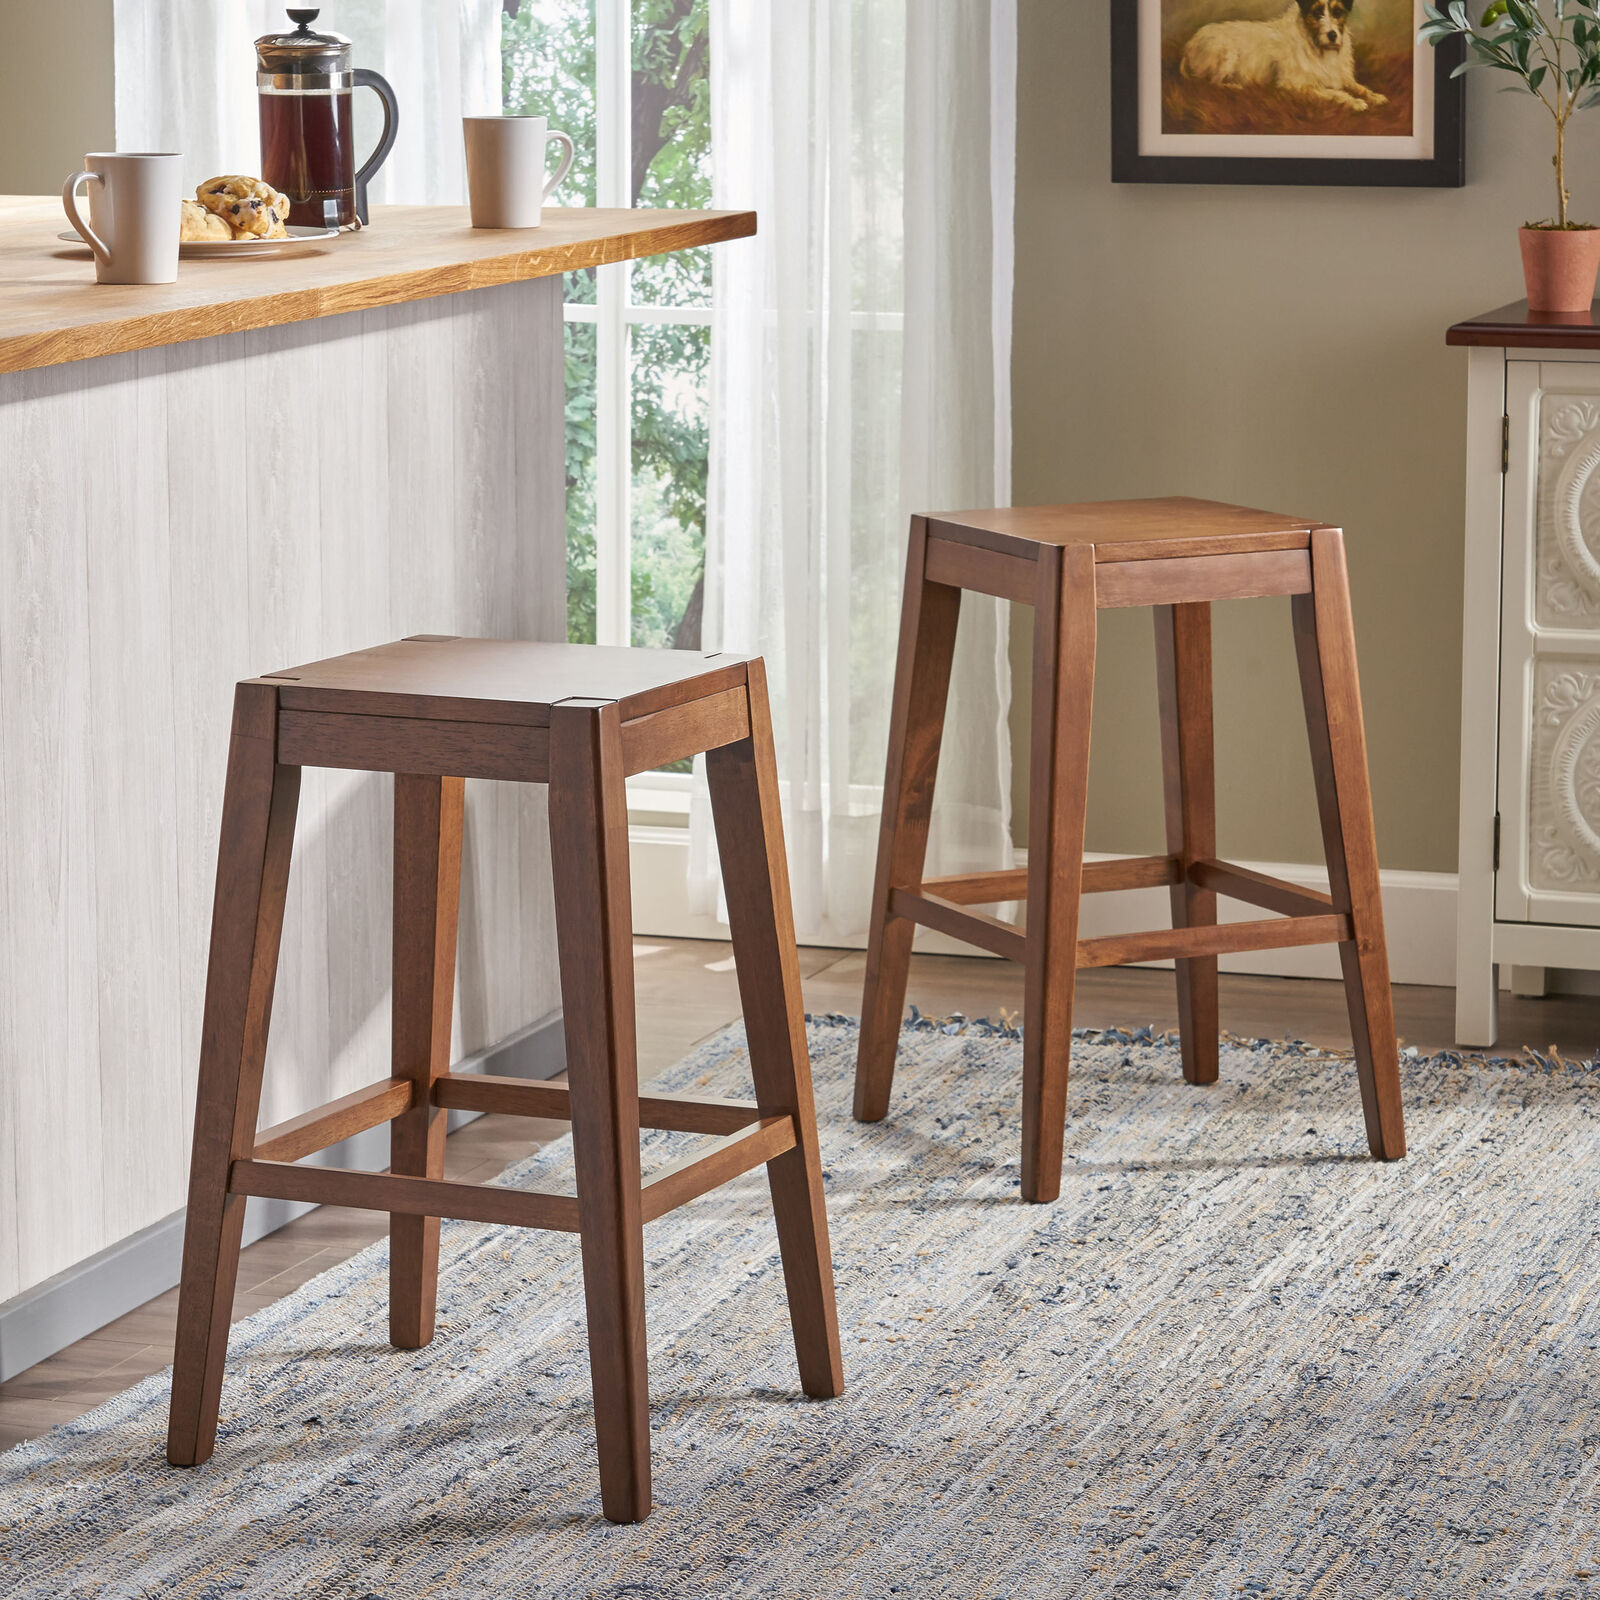 Elaina 26″ Wooden Counter Stool (Set of 2) Benches, Stools & Bar Stools